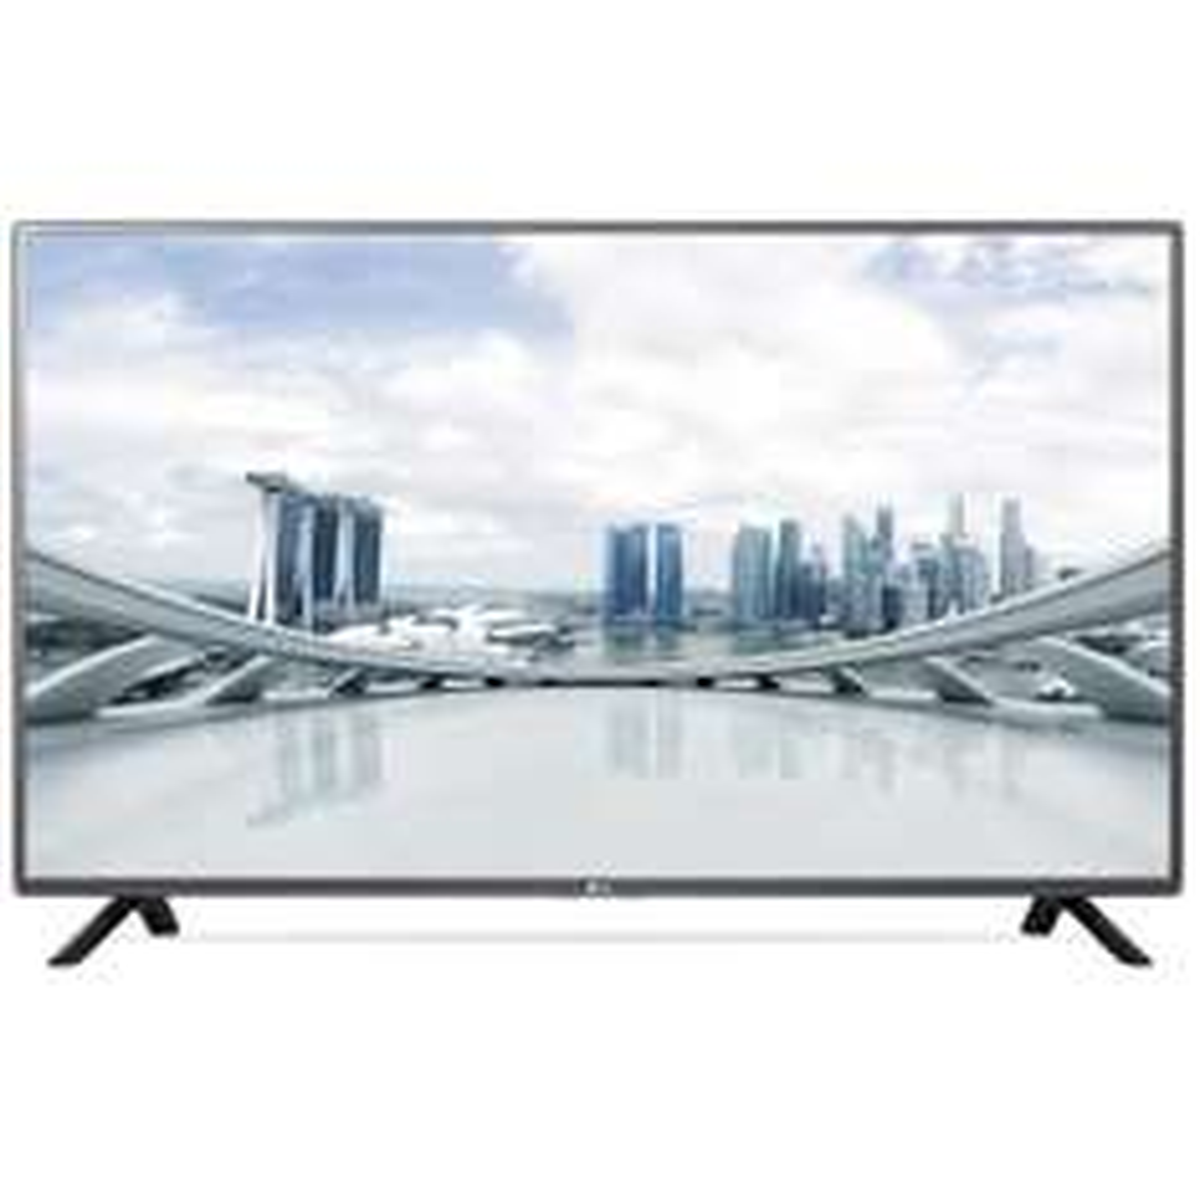 El Buen Fin 2016 en Amazon: pantalla LG 50LH5730, Smart TV de 50 pulgadas, Full HD (Modelo 2017)